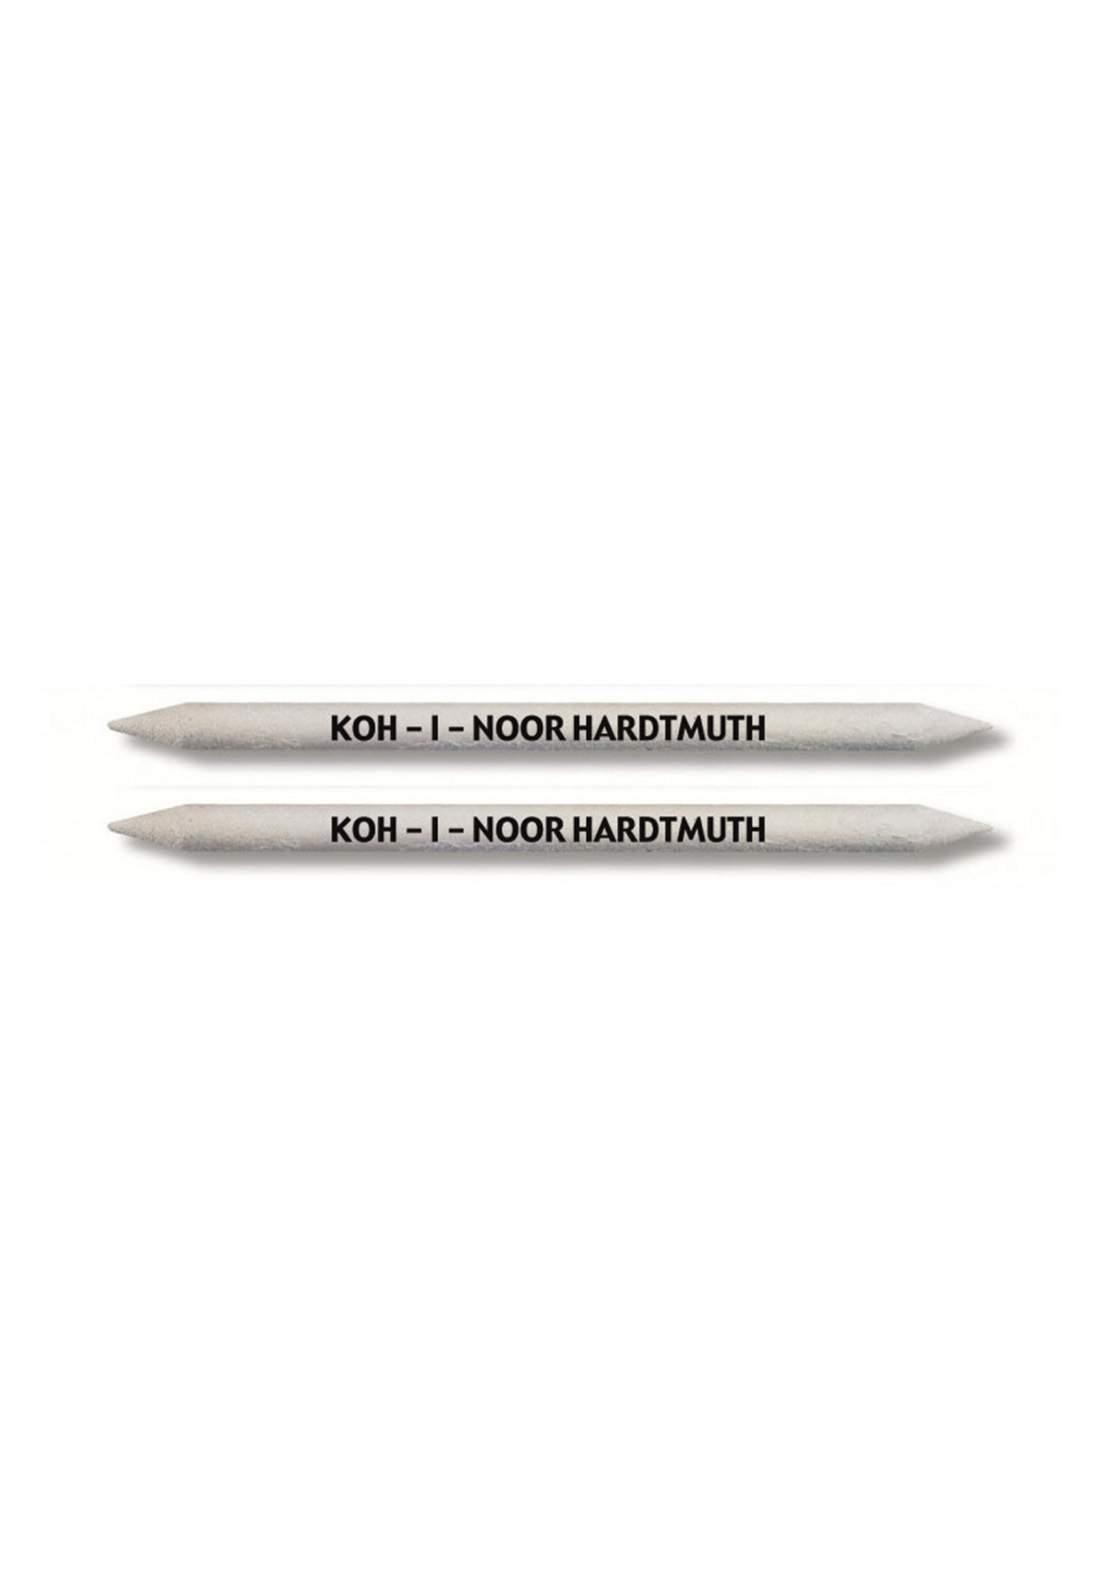 Koh-I-Noor Hardtmuth 7 х 120 mm سيت مدعكة ثنائية